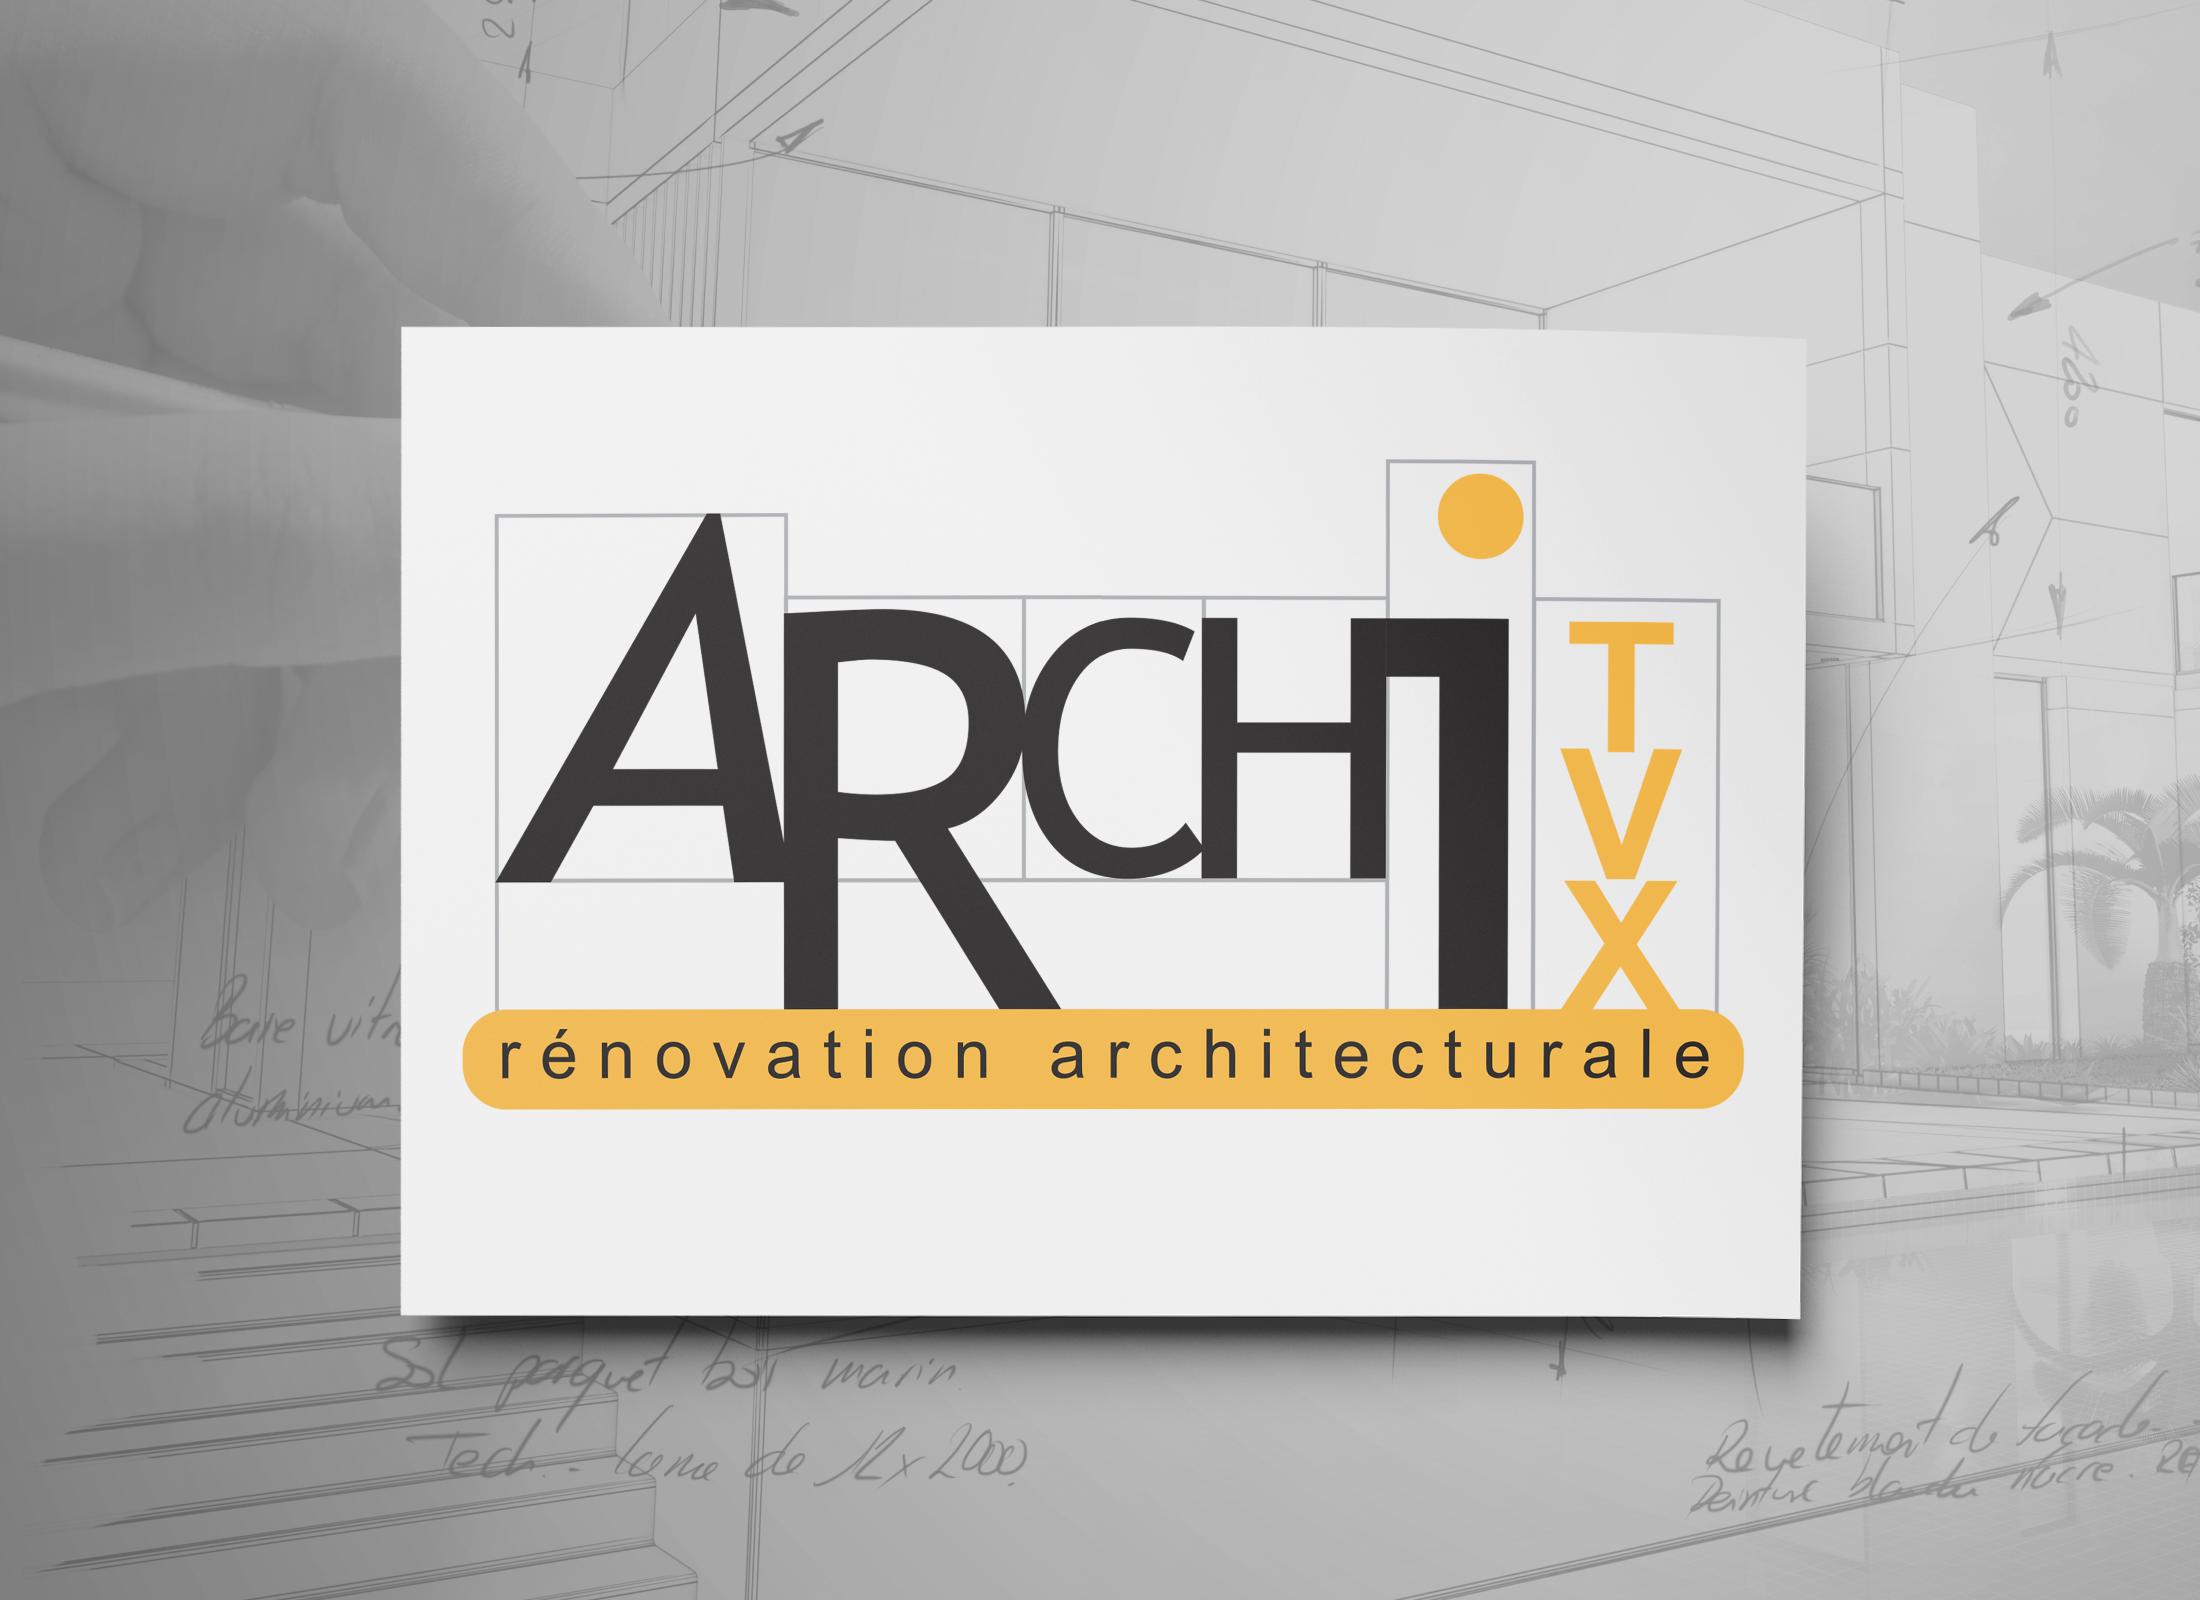 ARCHI TVX